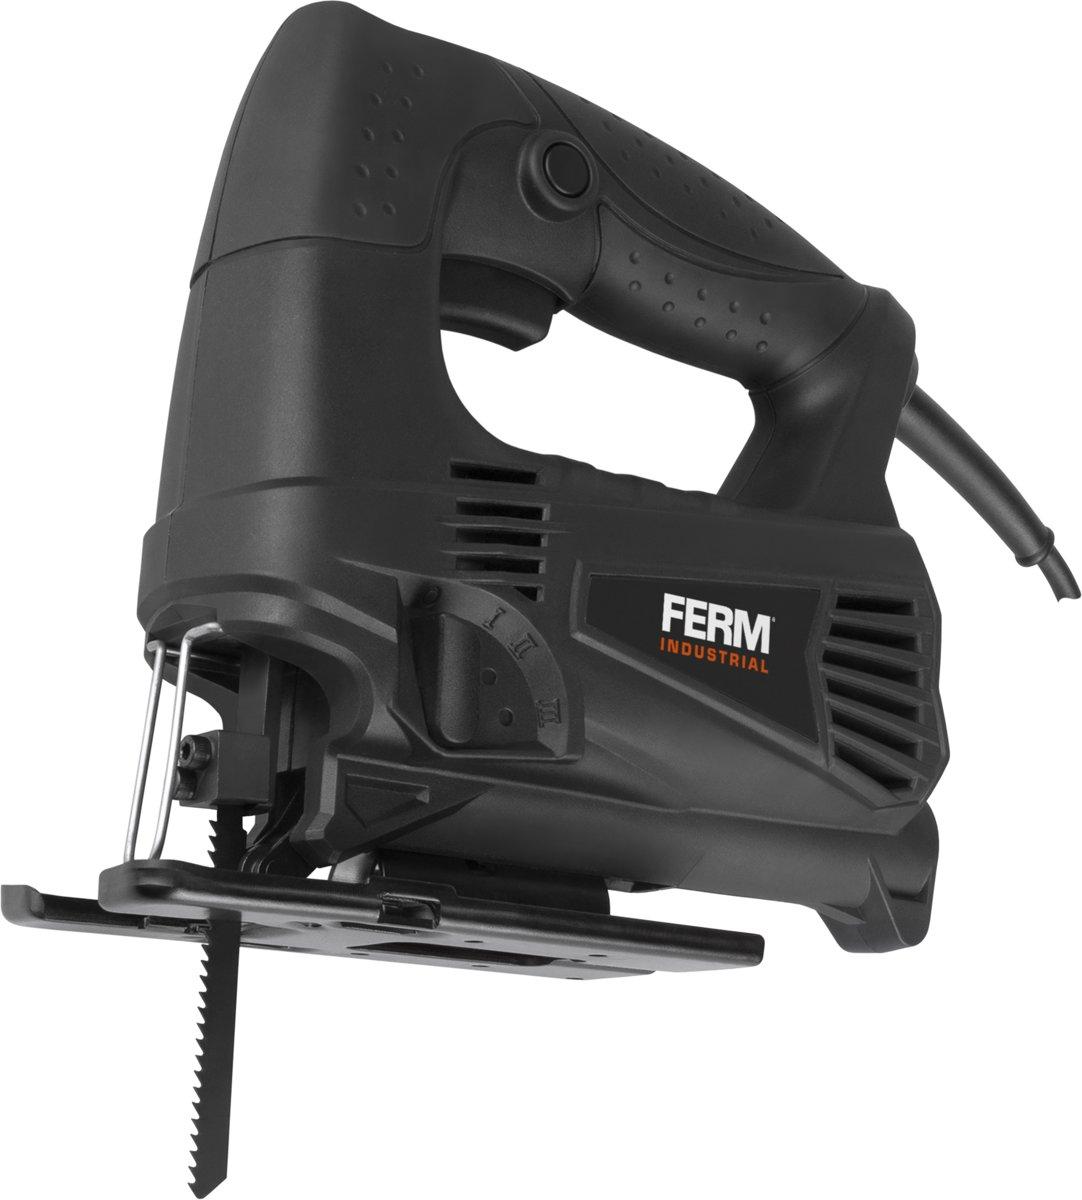 FERM JSM1028P Decoupeerzaag – 450W - Professioneel – 4 pendelposities – Incl. 2 zaagbladen en opbergkoffer